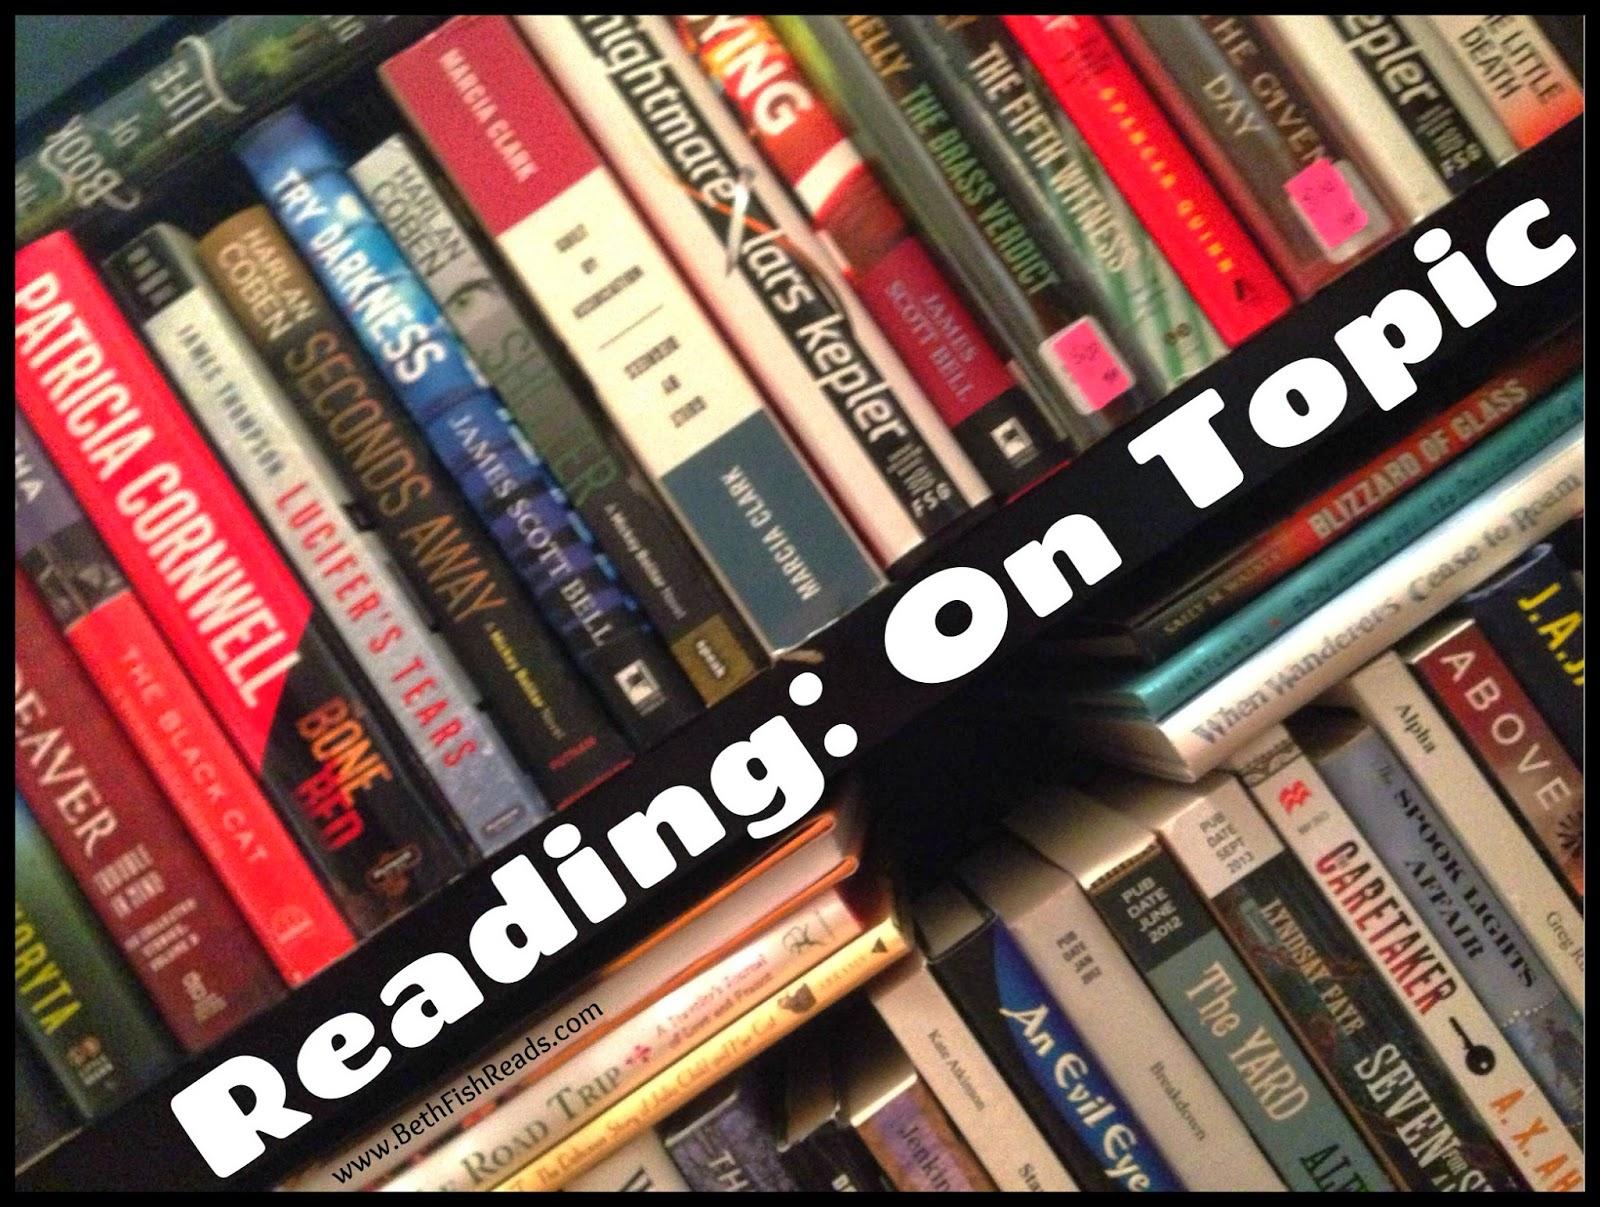 Reading on Topic: Music @ BethFishReads.com